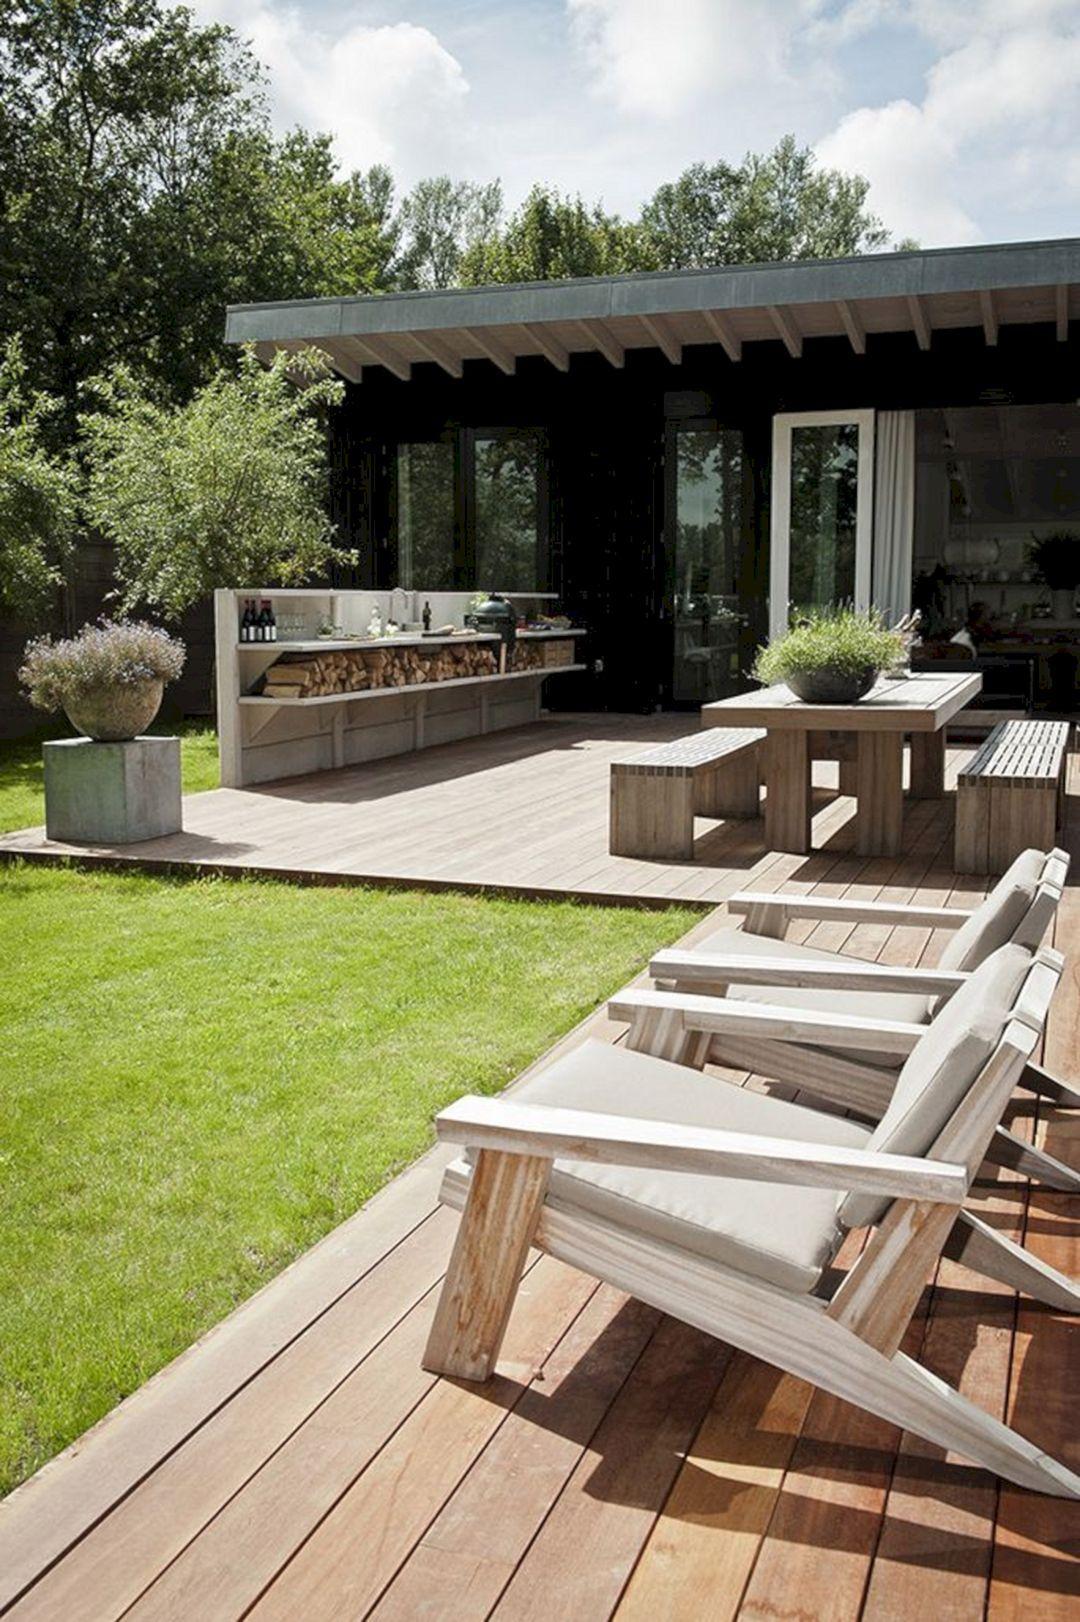 20 Incredible Backyard Patio Ideas With Modern Deck You Have To Know Decor Gardening Ideas Patio Garden Design Patio Design Small Patio Garden Modern garden ideas with bar